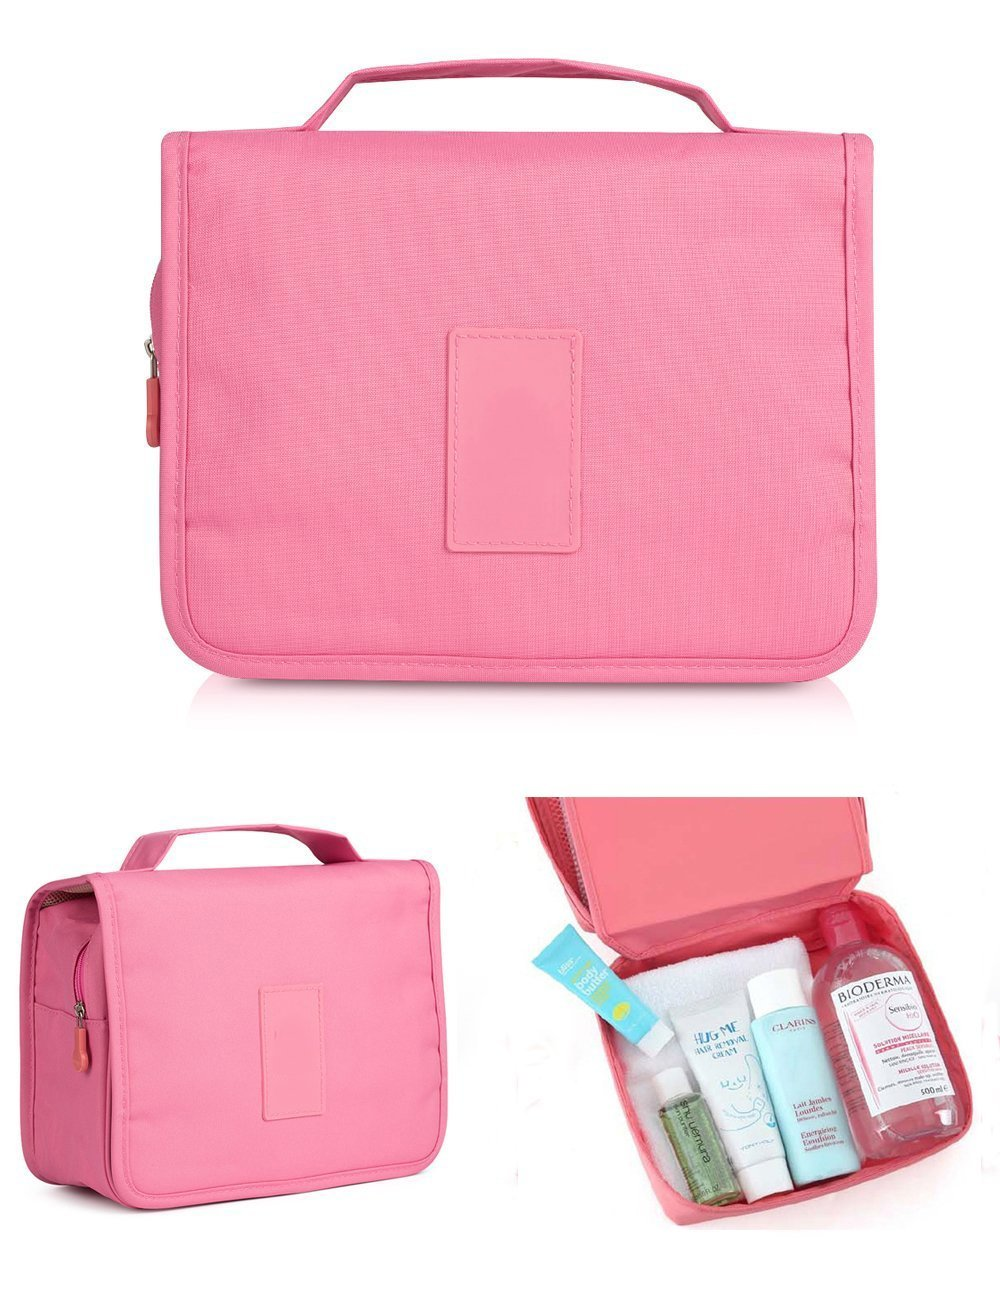 CINEEN Travel Handbag Multifunctional Cosmetics Wash Waterproof Bag Pink